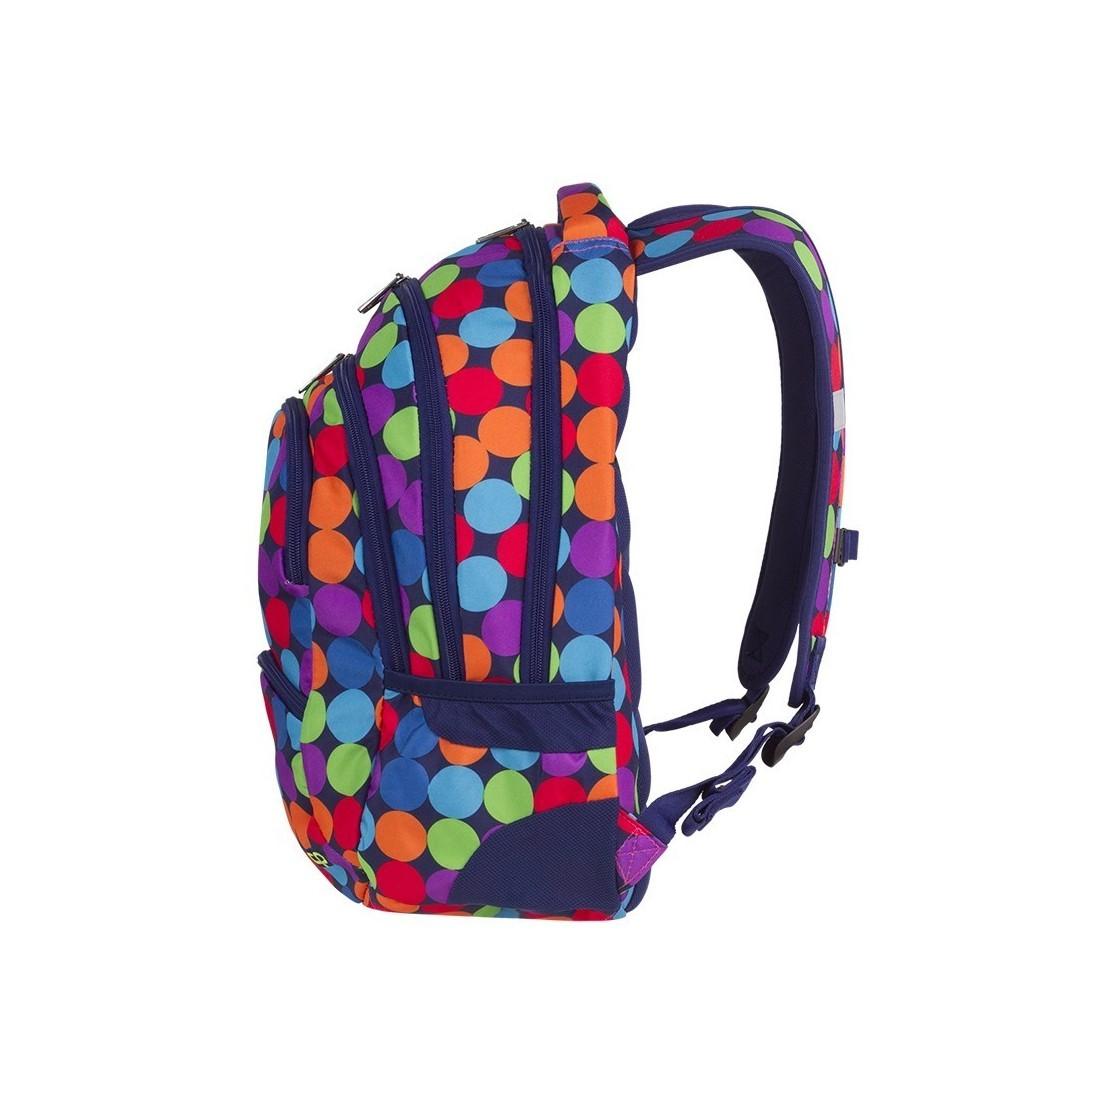 00053035d3658 ... Plecak młodzieżowy CoolPack CP COLLEGE BUBBLE SHOOTER kolorowe kropki  kulki - 5 przegród - A490 ...